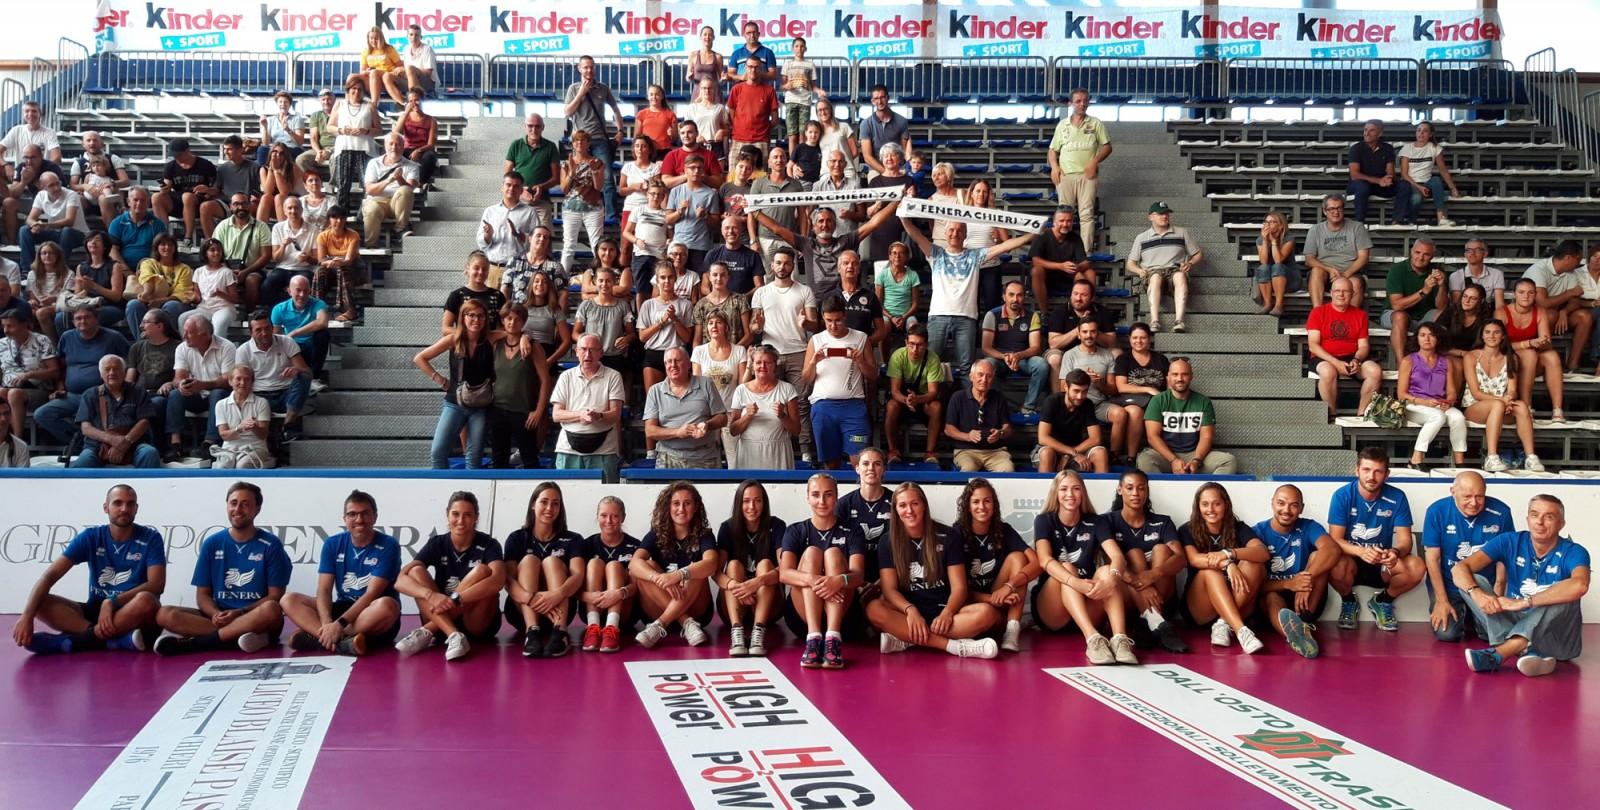 Serie A1: Reale Mutua Fenera Chieri '76 - Club Italia Crai